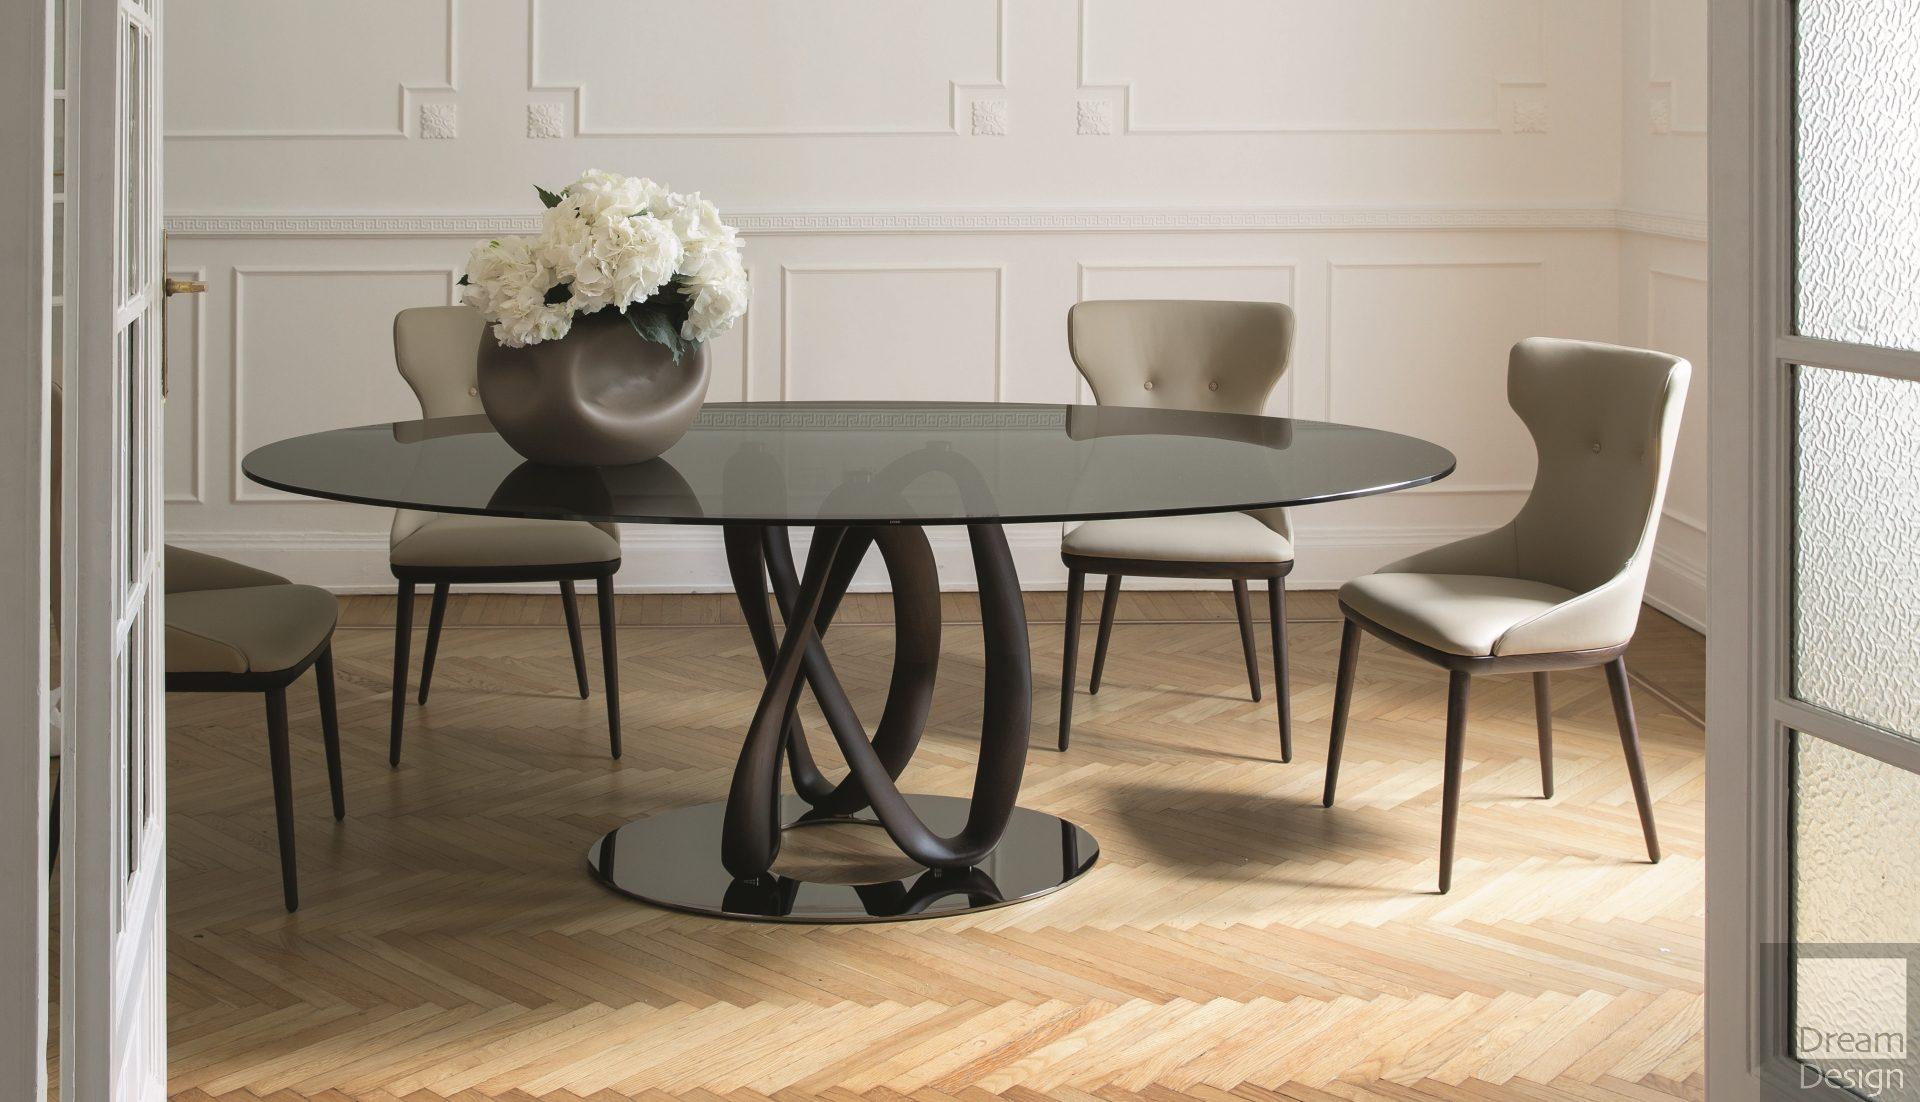 Porada Infinity Elliptic Glass Table